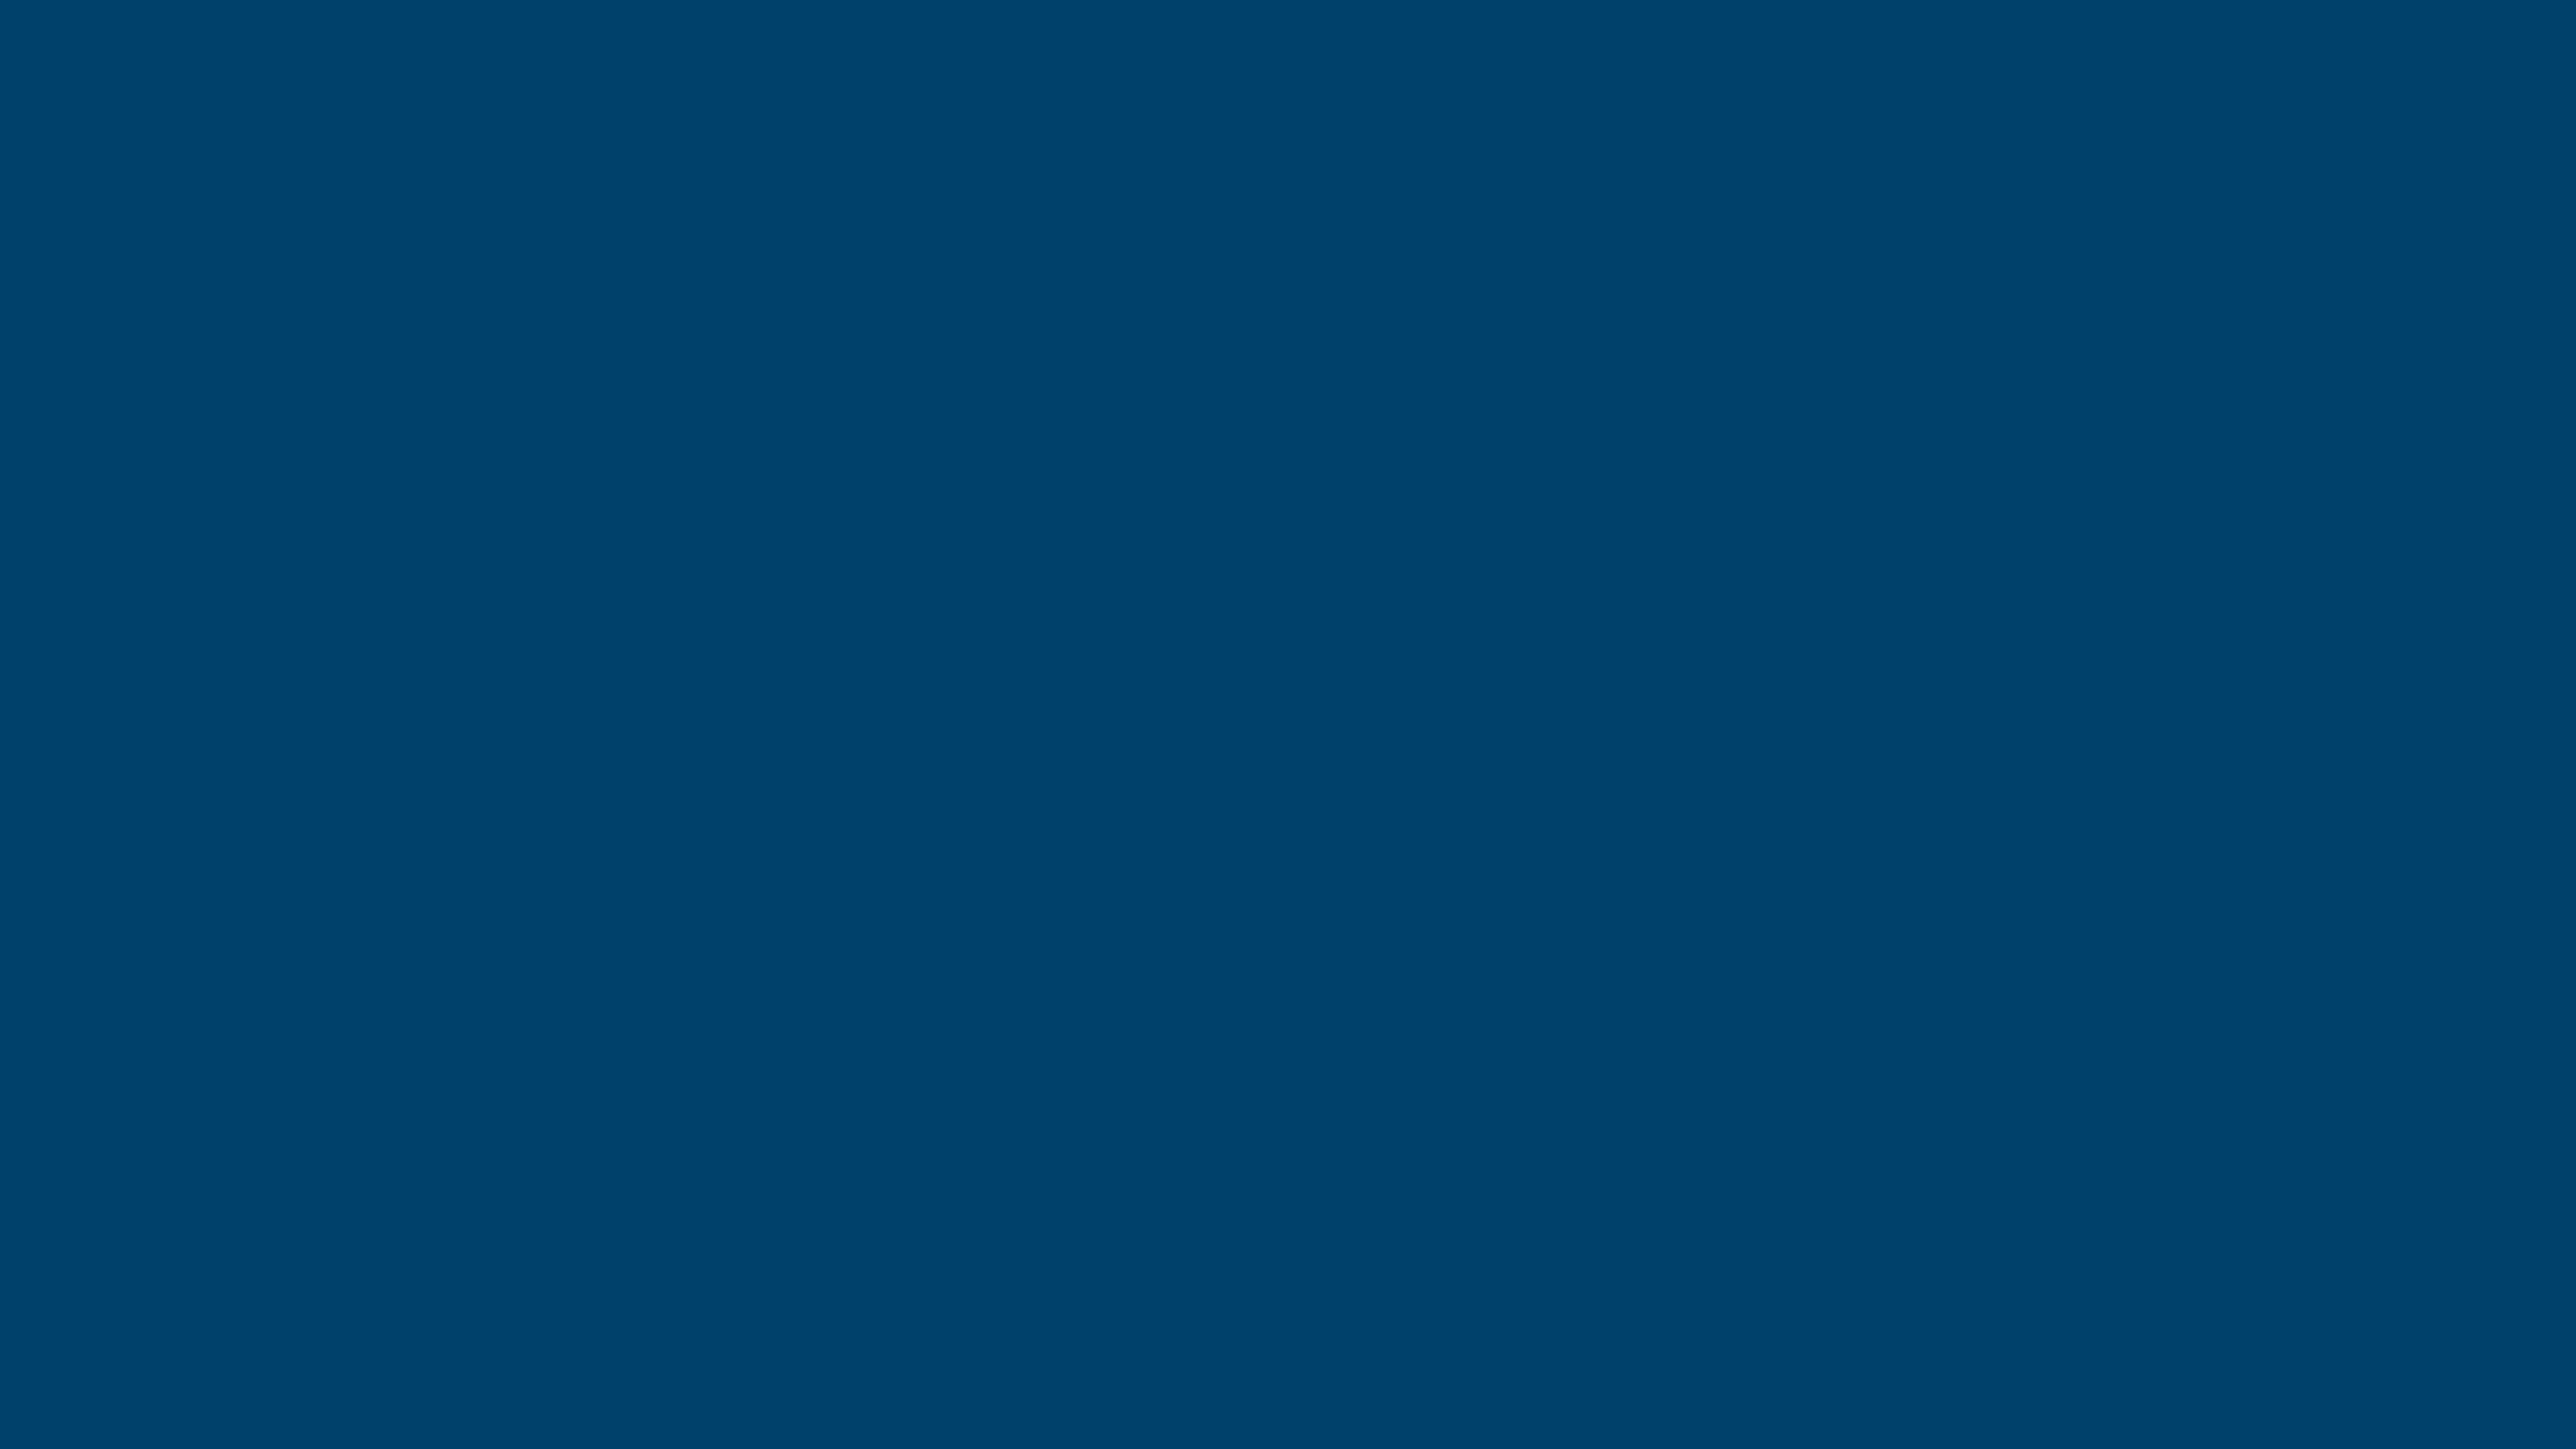 5120x2880 Indigo Dye Solid Color Background